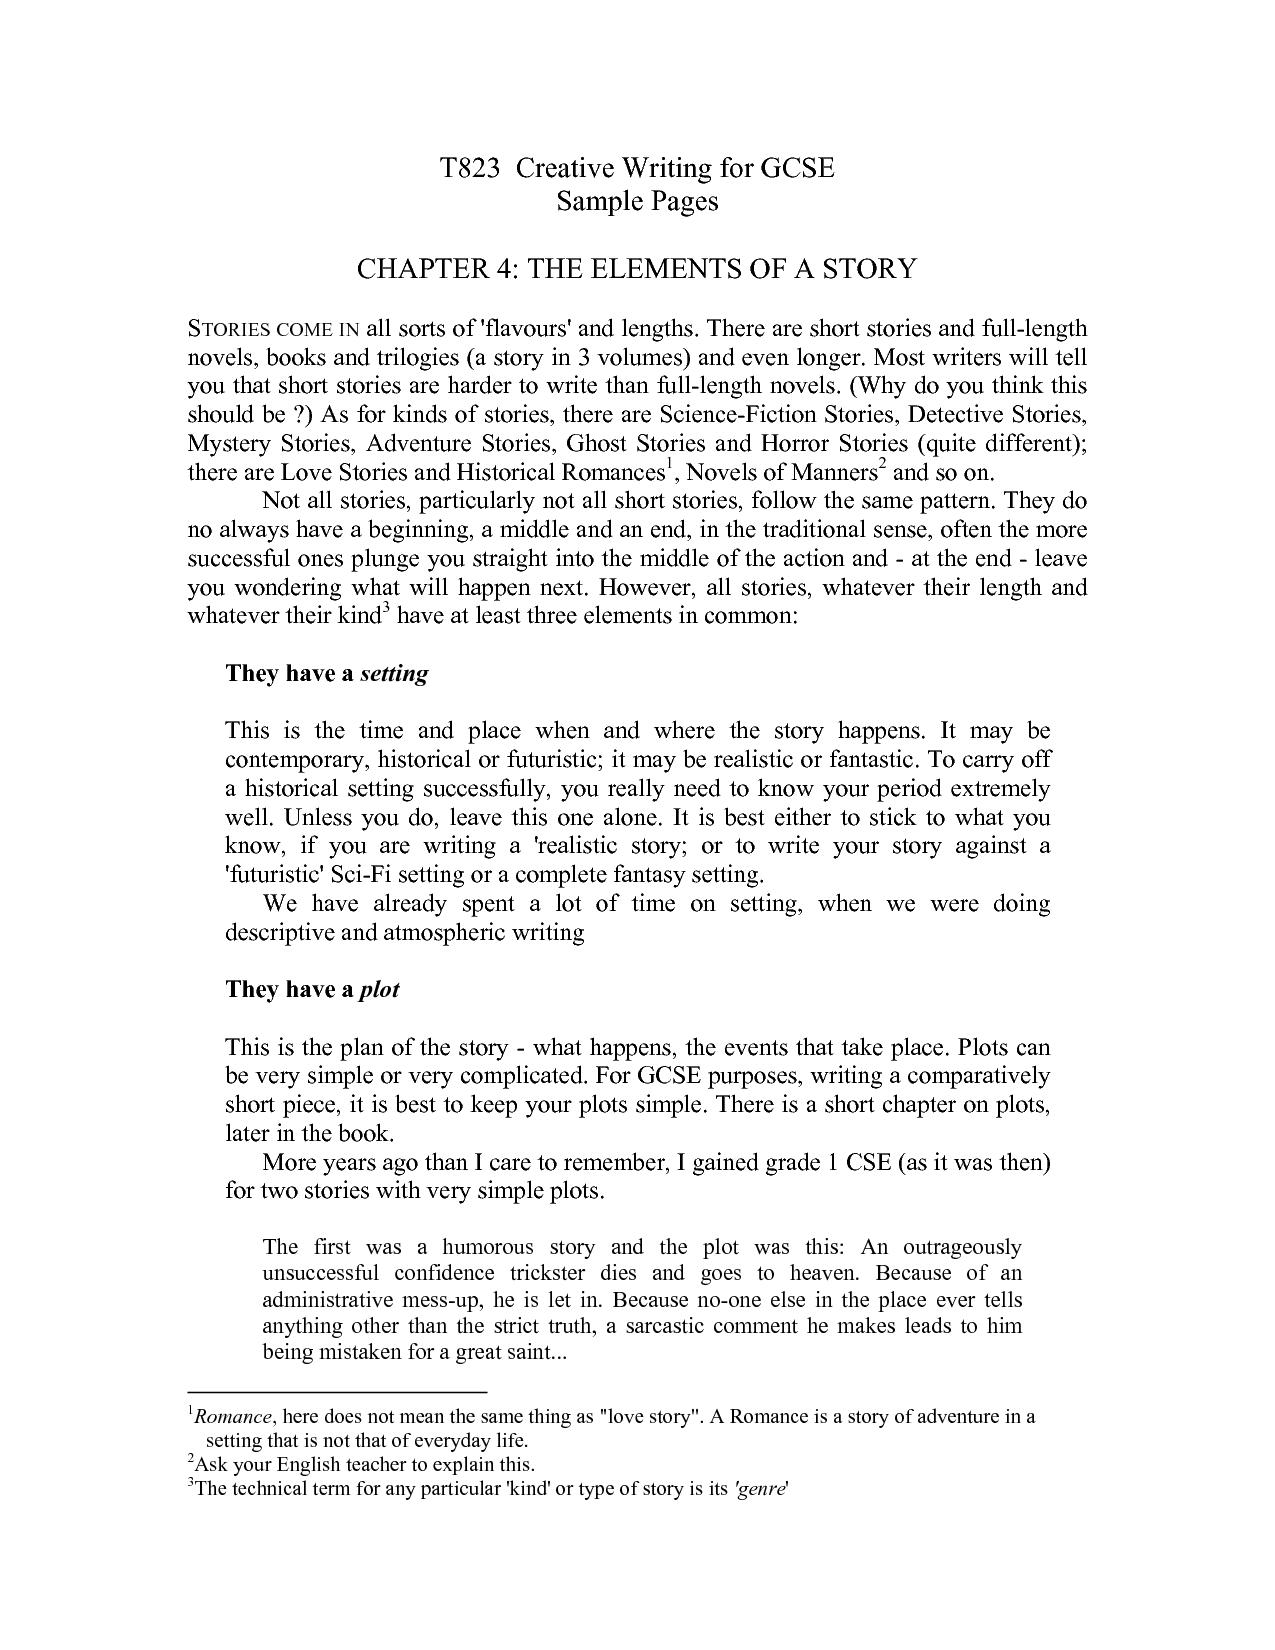 Short Resume Examples Narrative College Essay College Personal Narrative Essay Examples